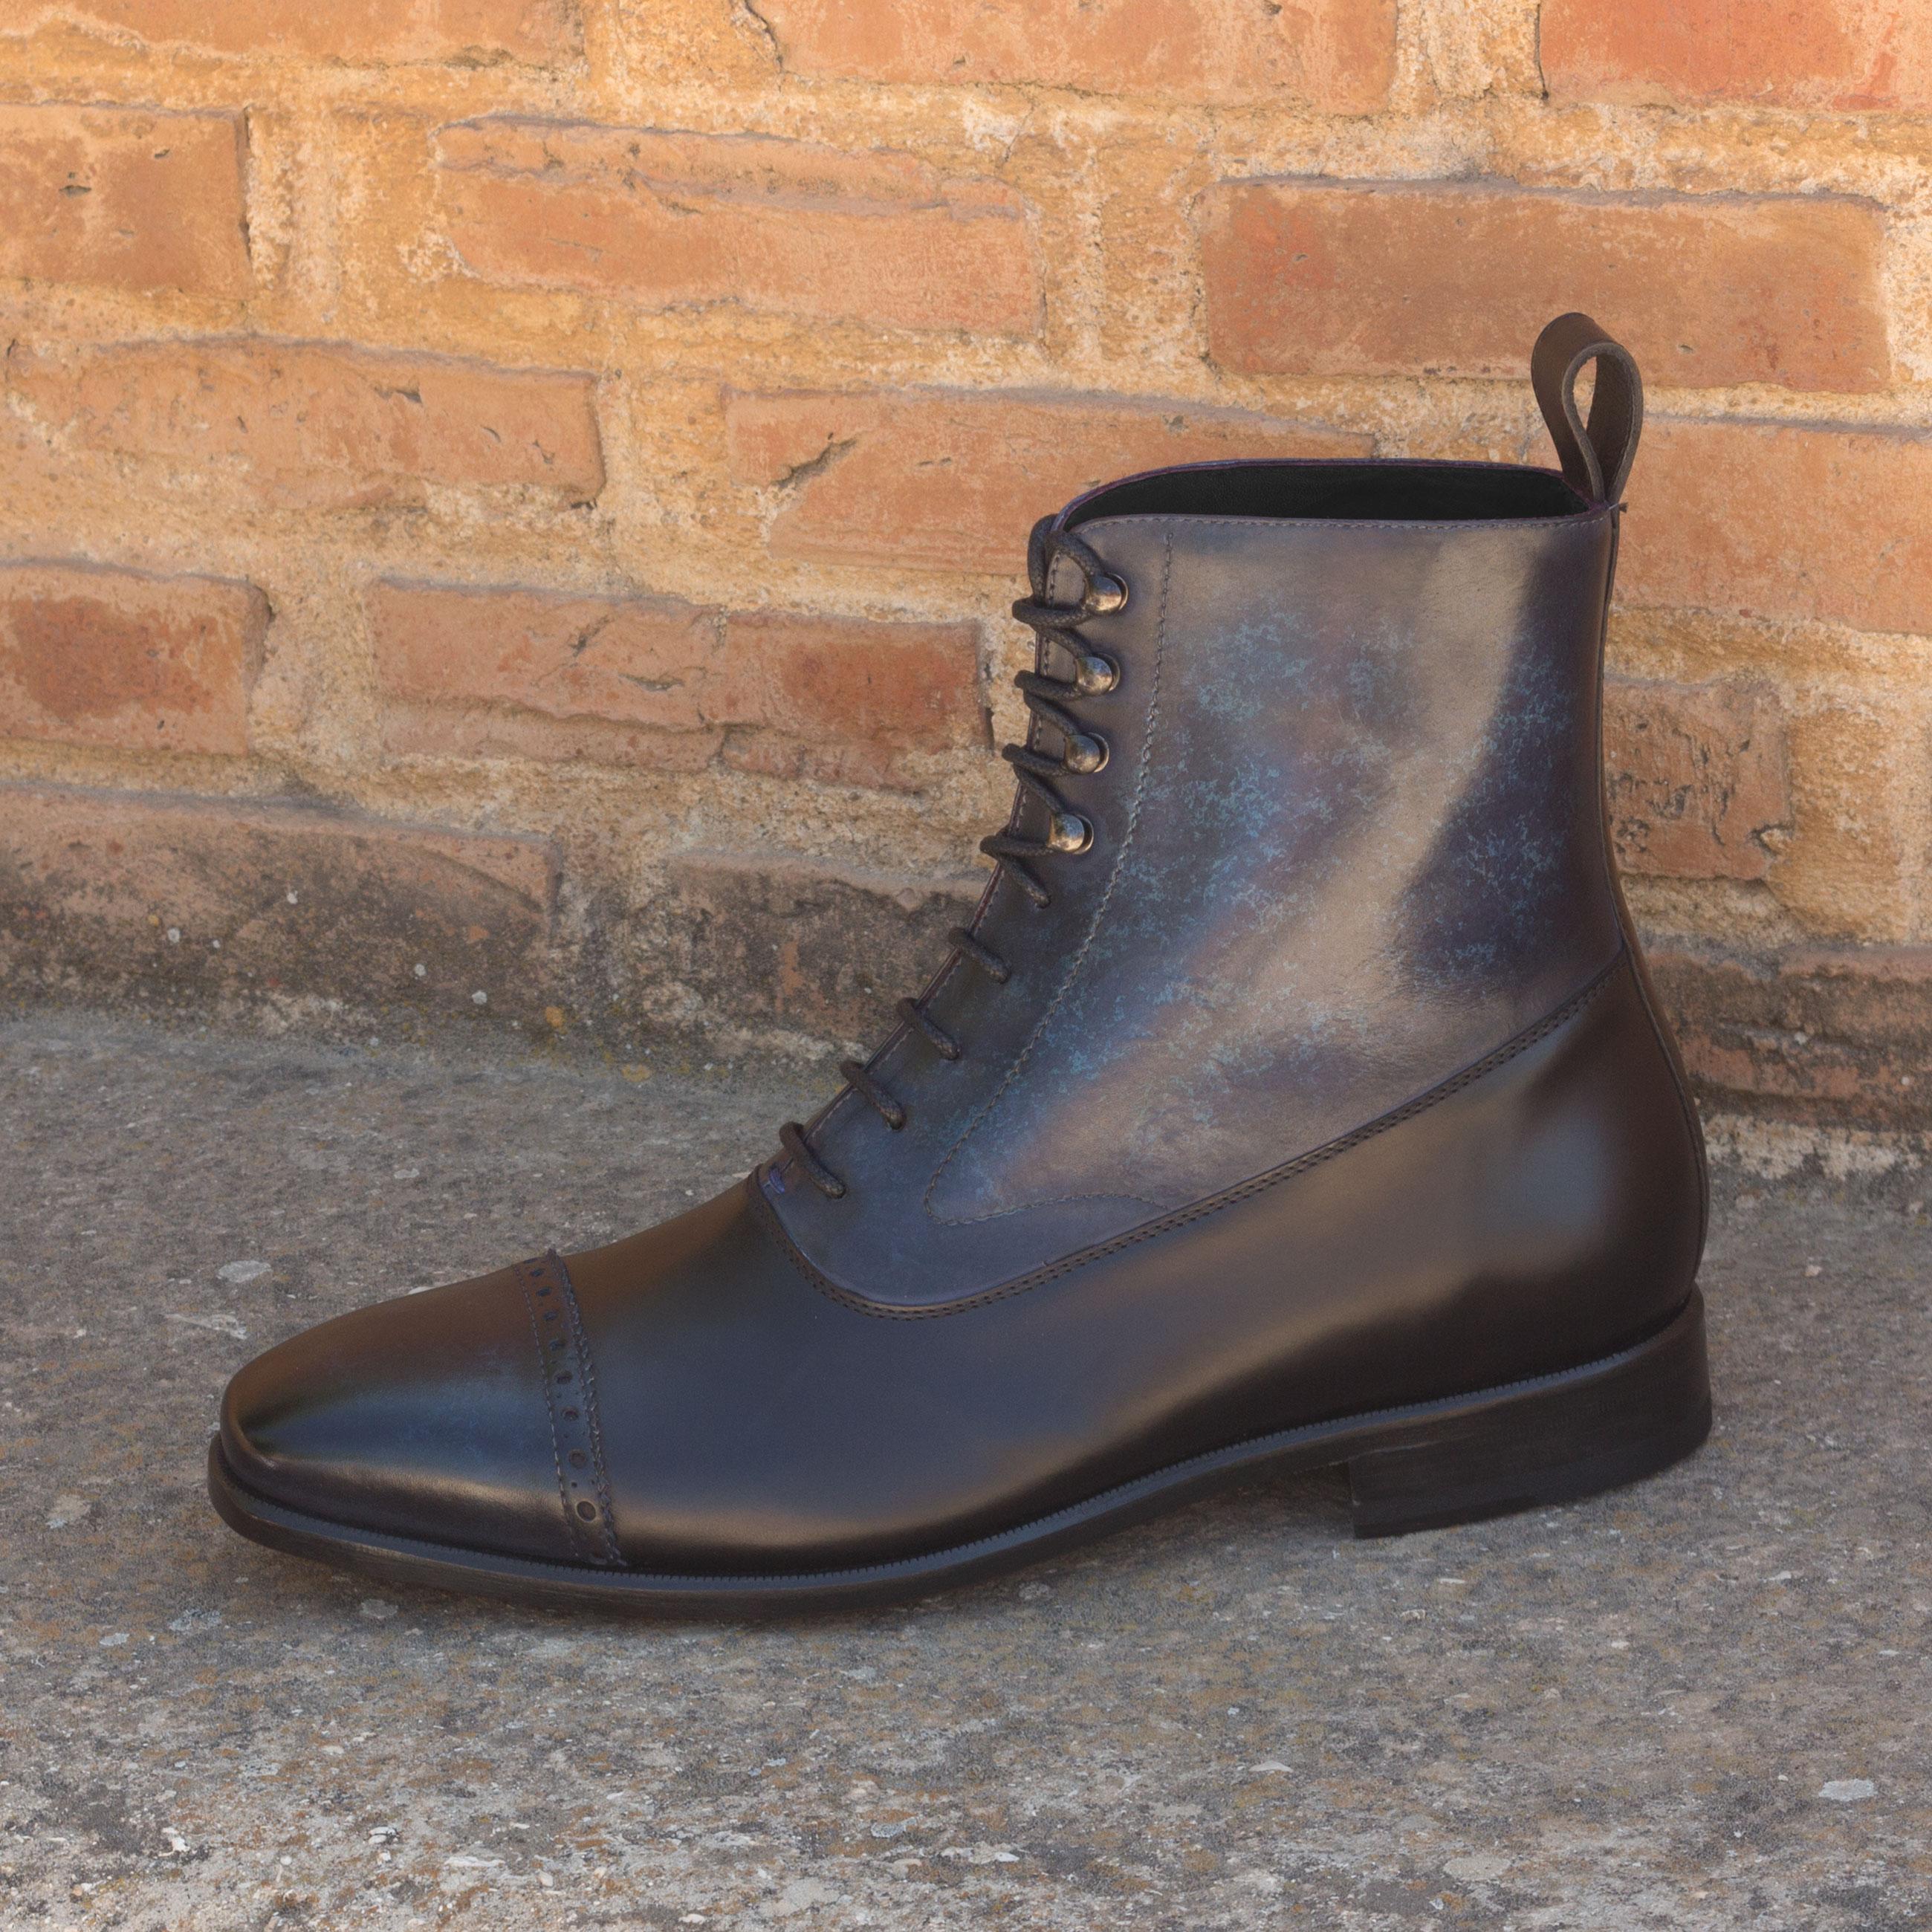 0b1ab6c80f862d Balmoral Boot black polished calf, denim crust patina - Animas Code